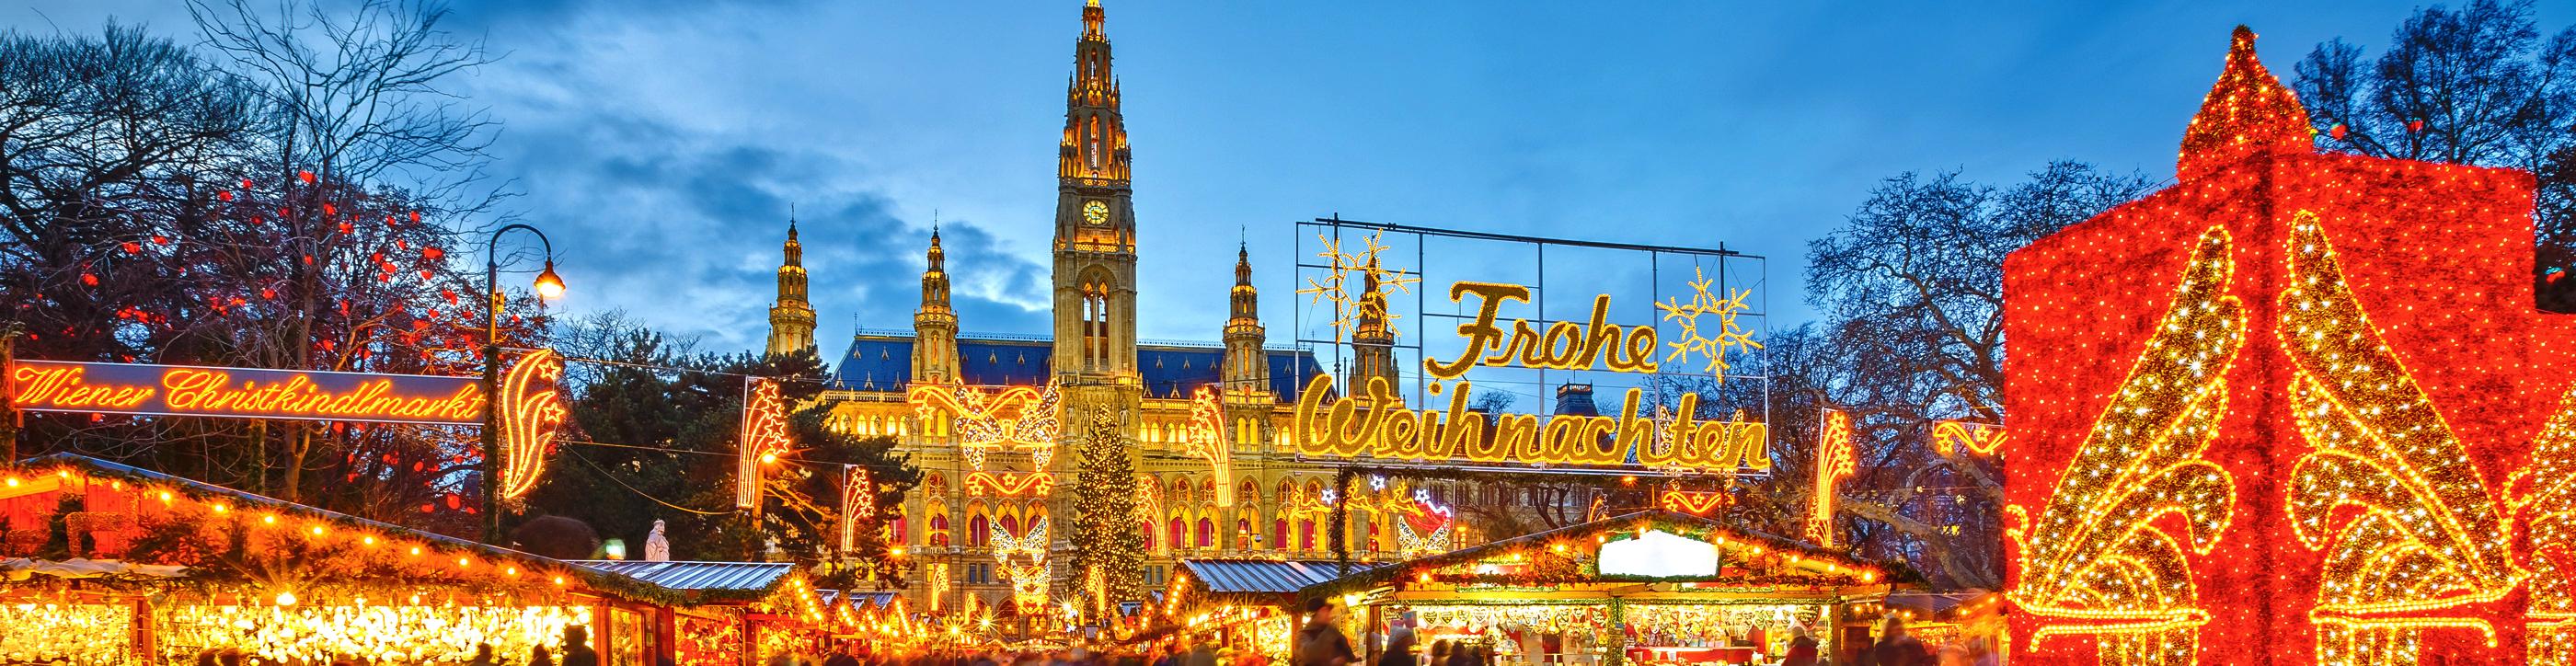 Uniworld Christmas Market 2020 Danube Holiday Markets 2020 | Danube River Cruise | Uniworld River